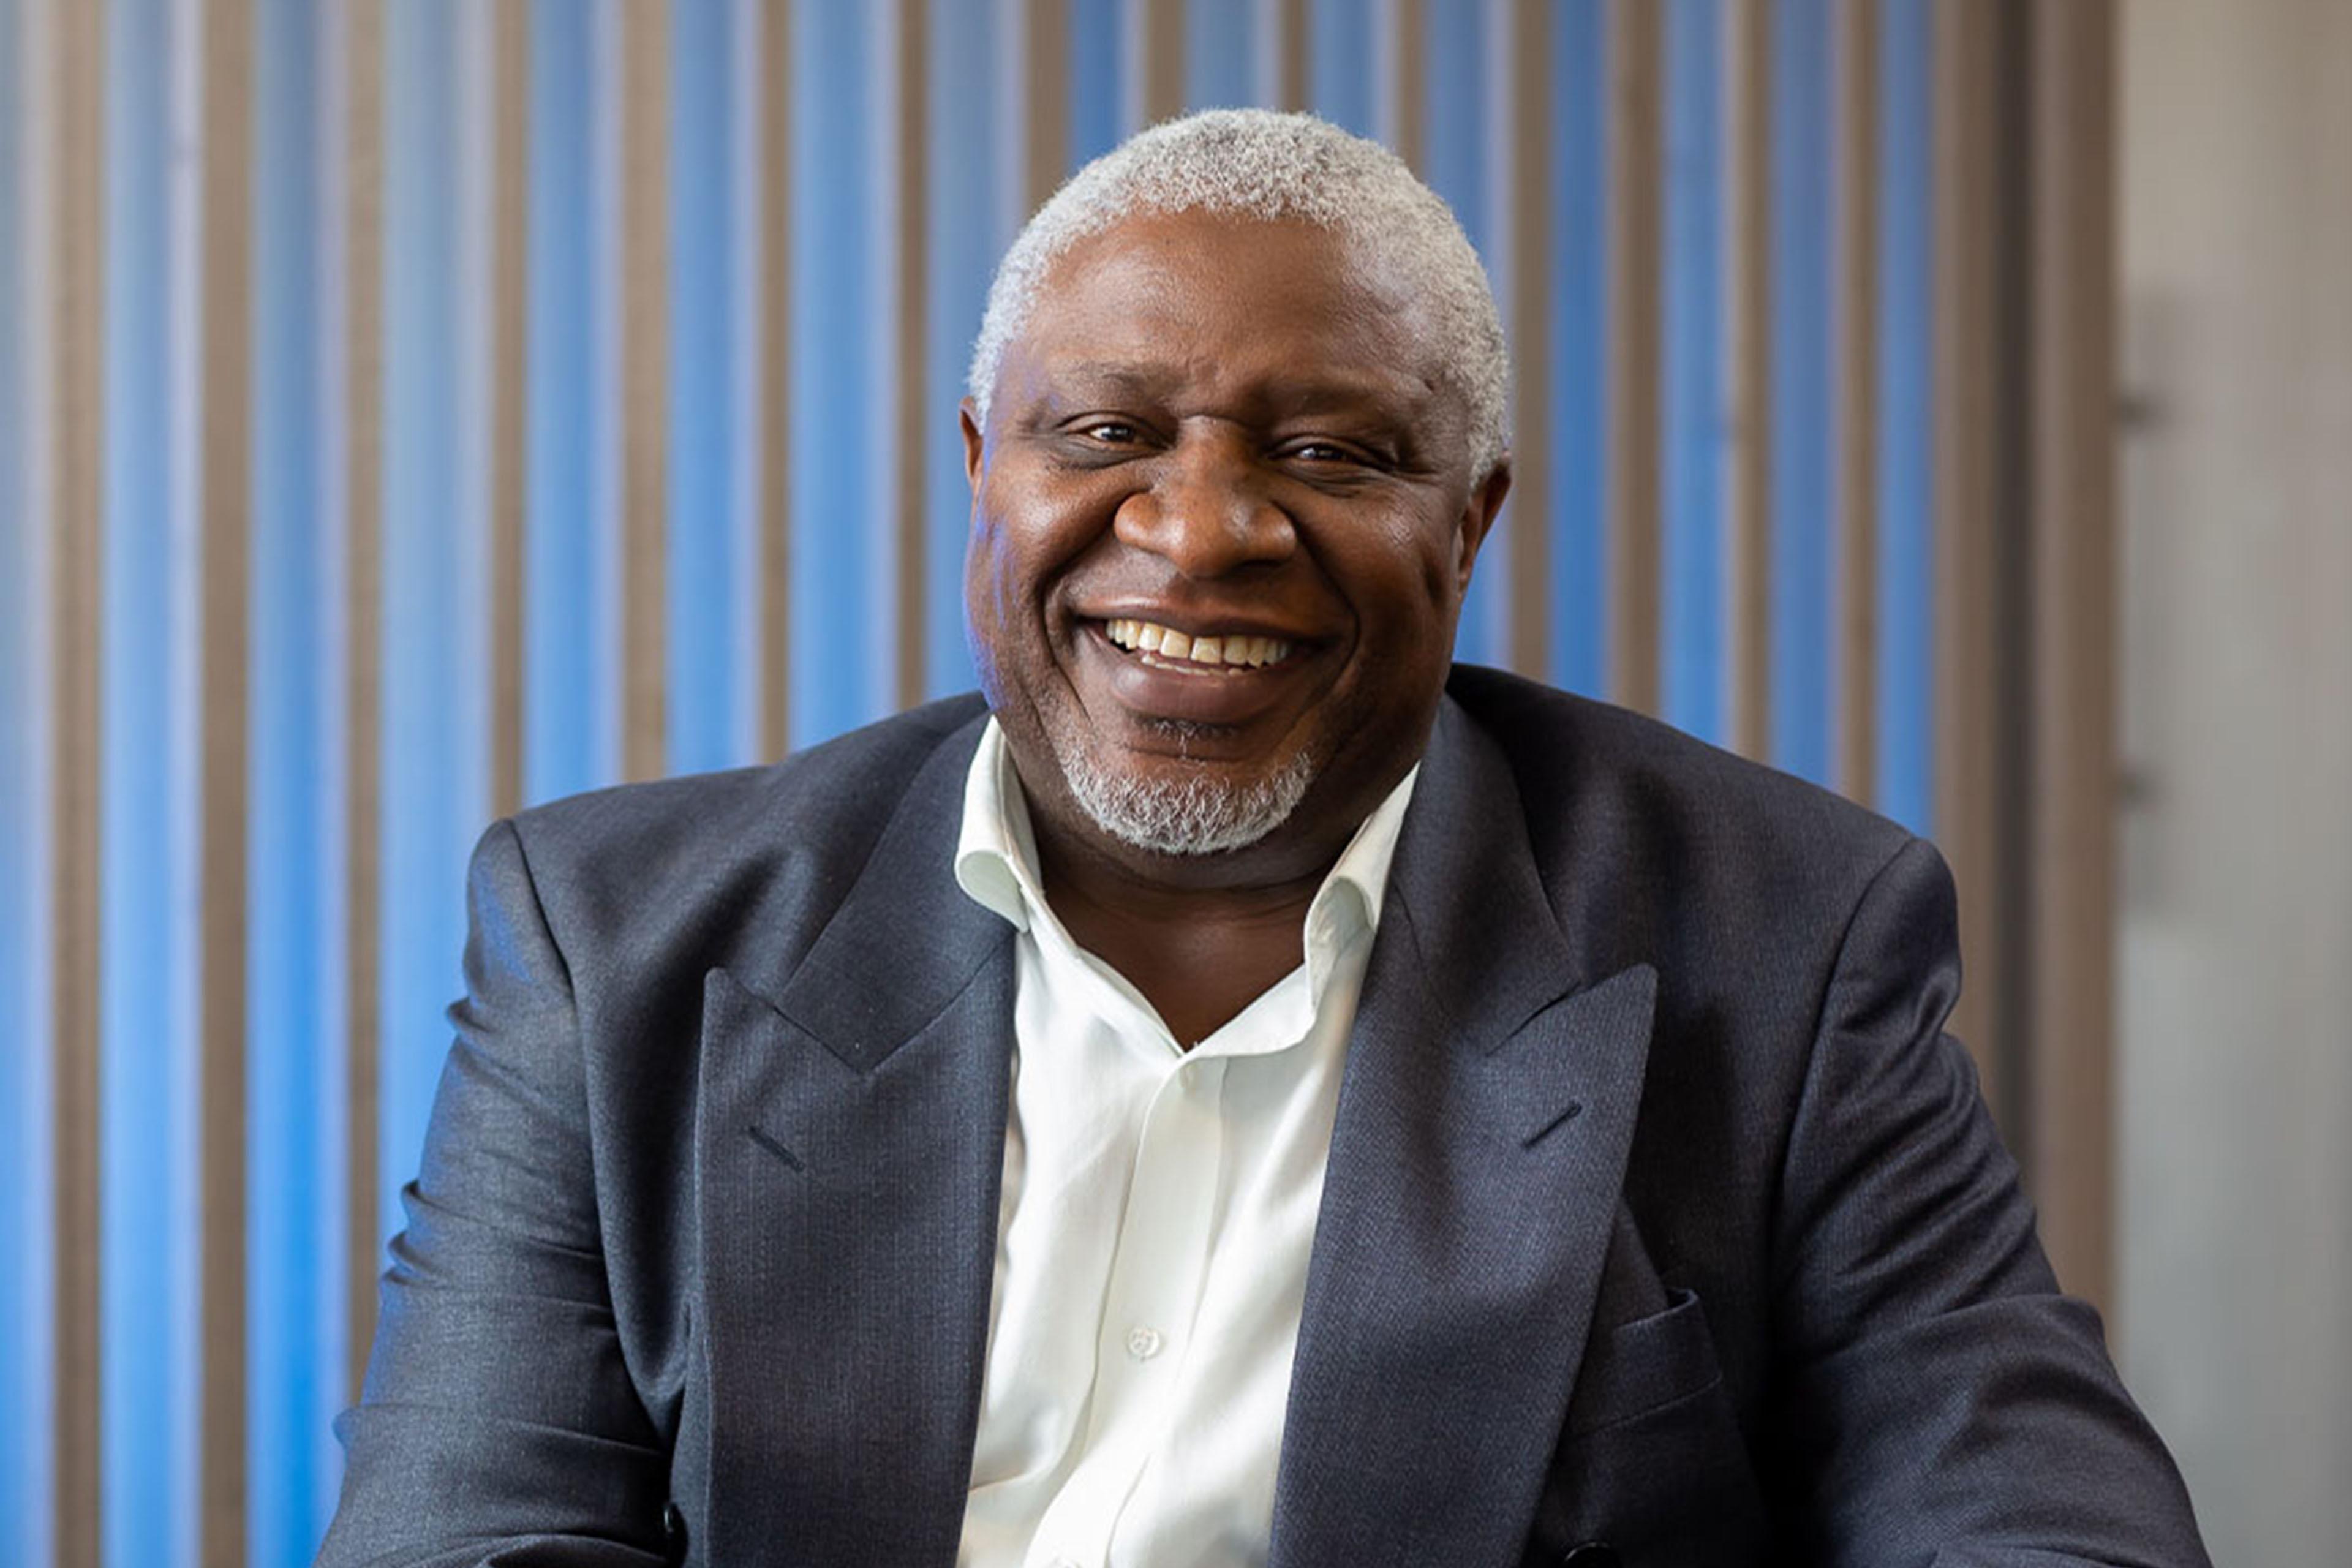 Photographic portrait of Sipho Nkosi